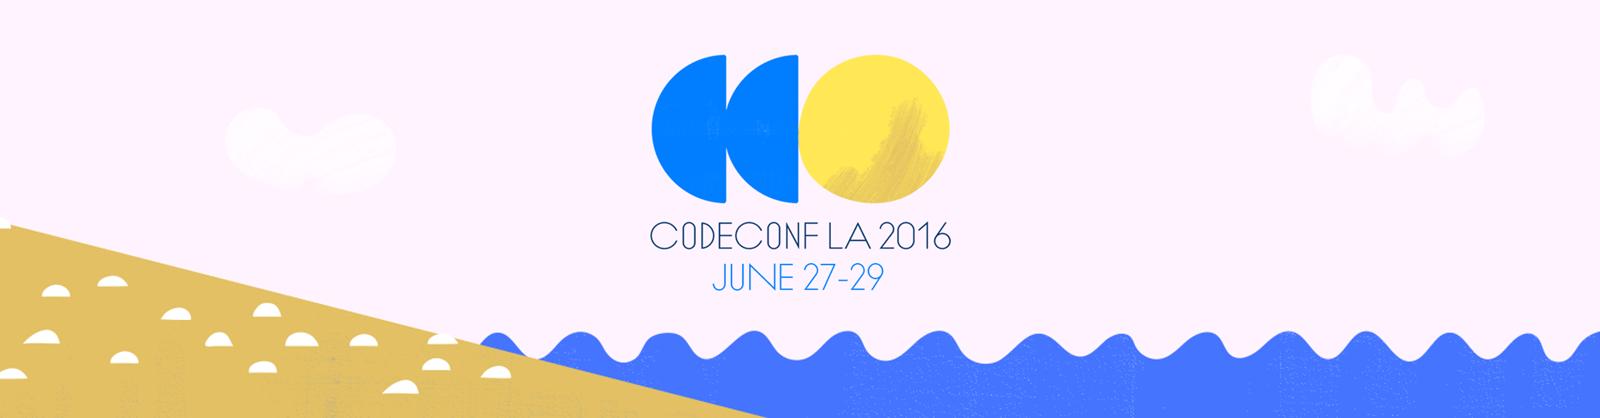 CodeConf LA is happening next month